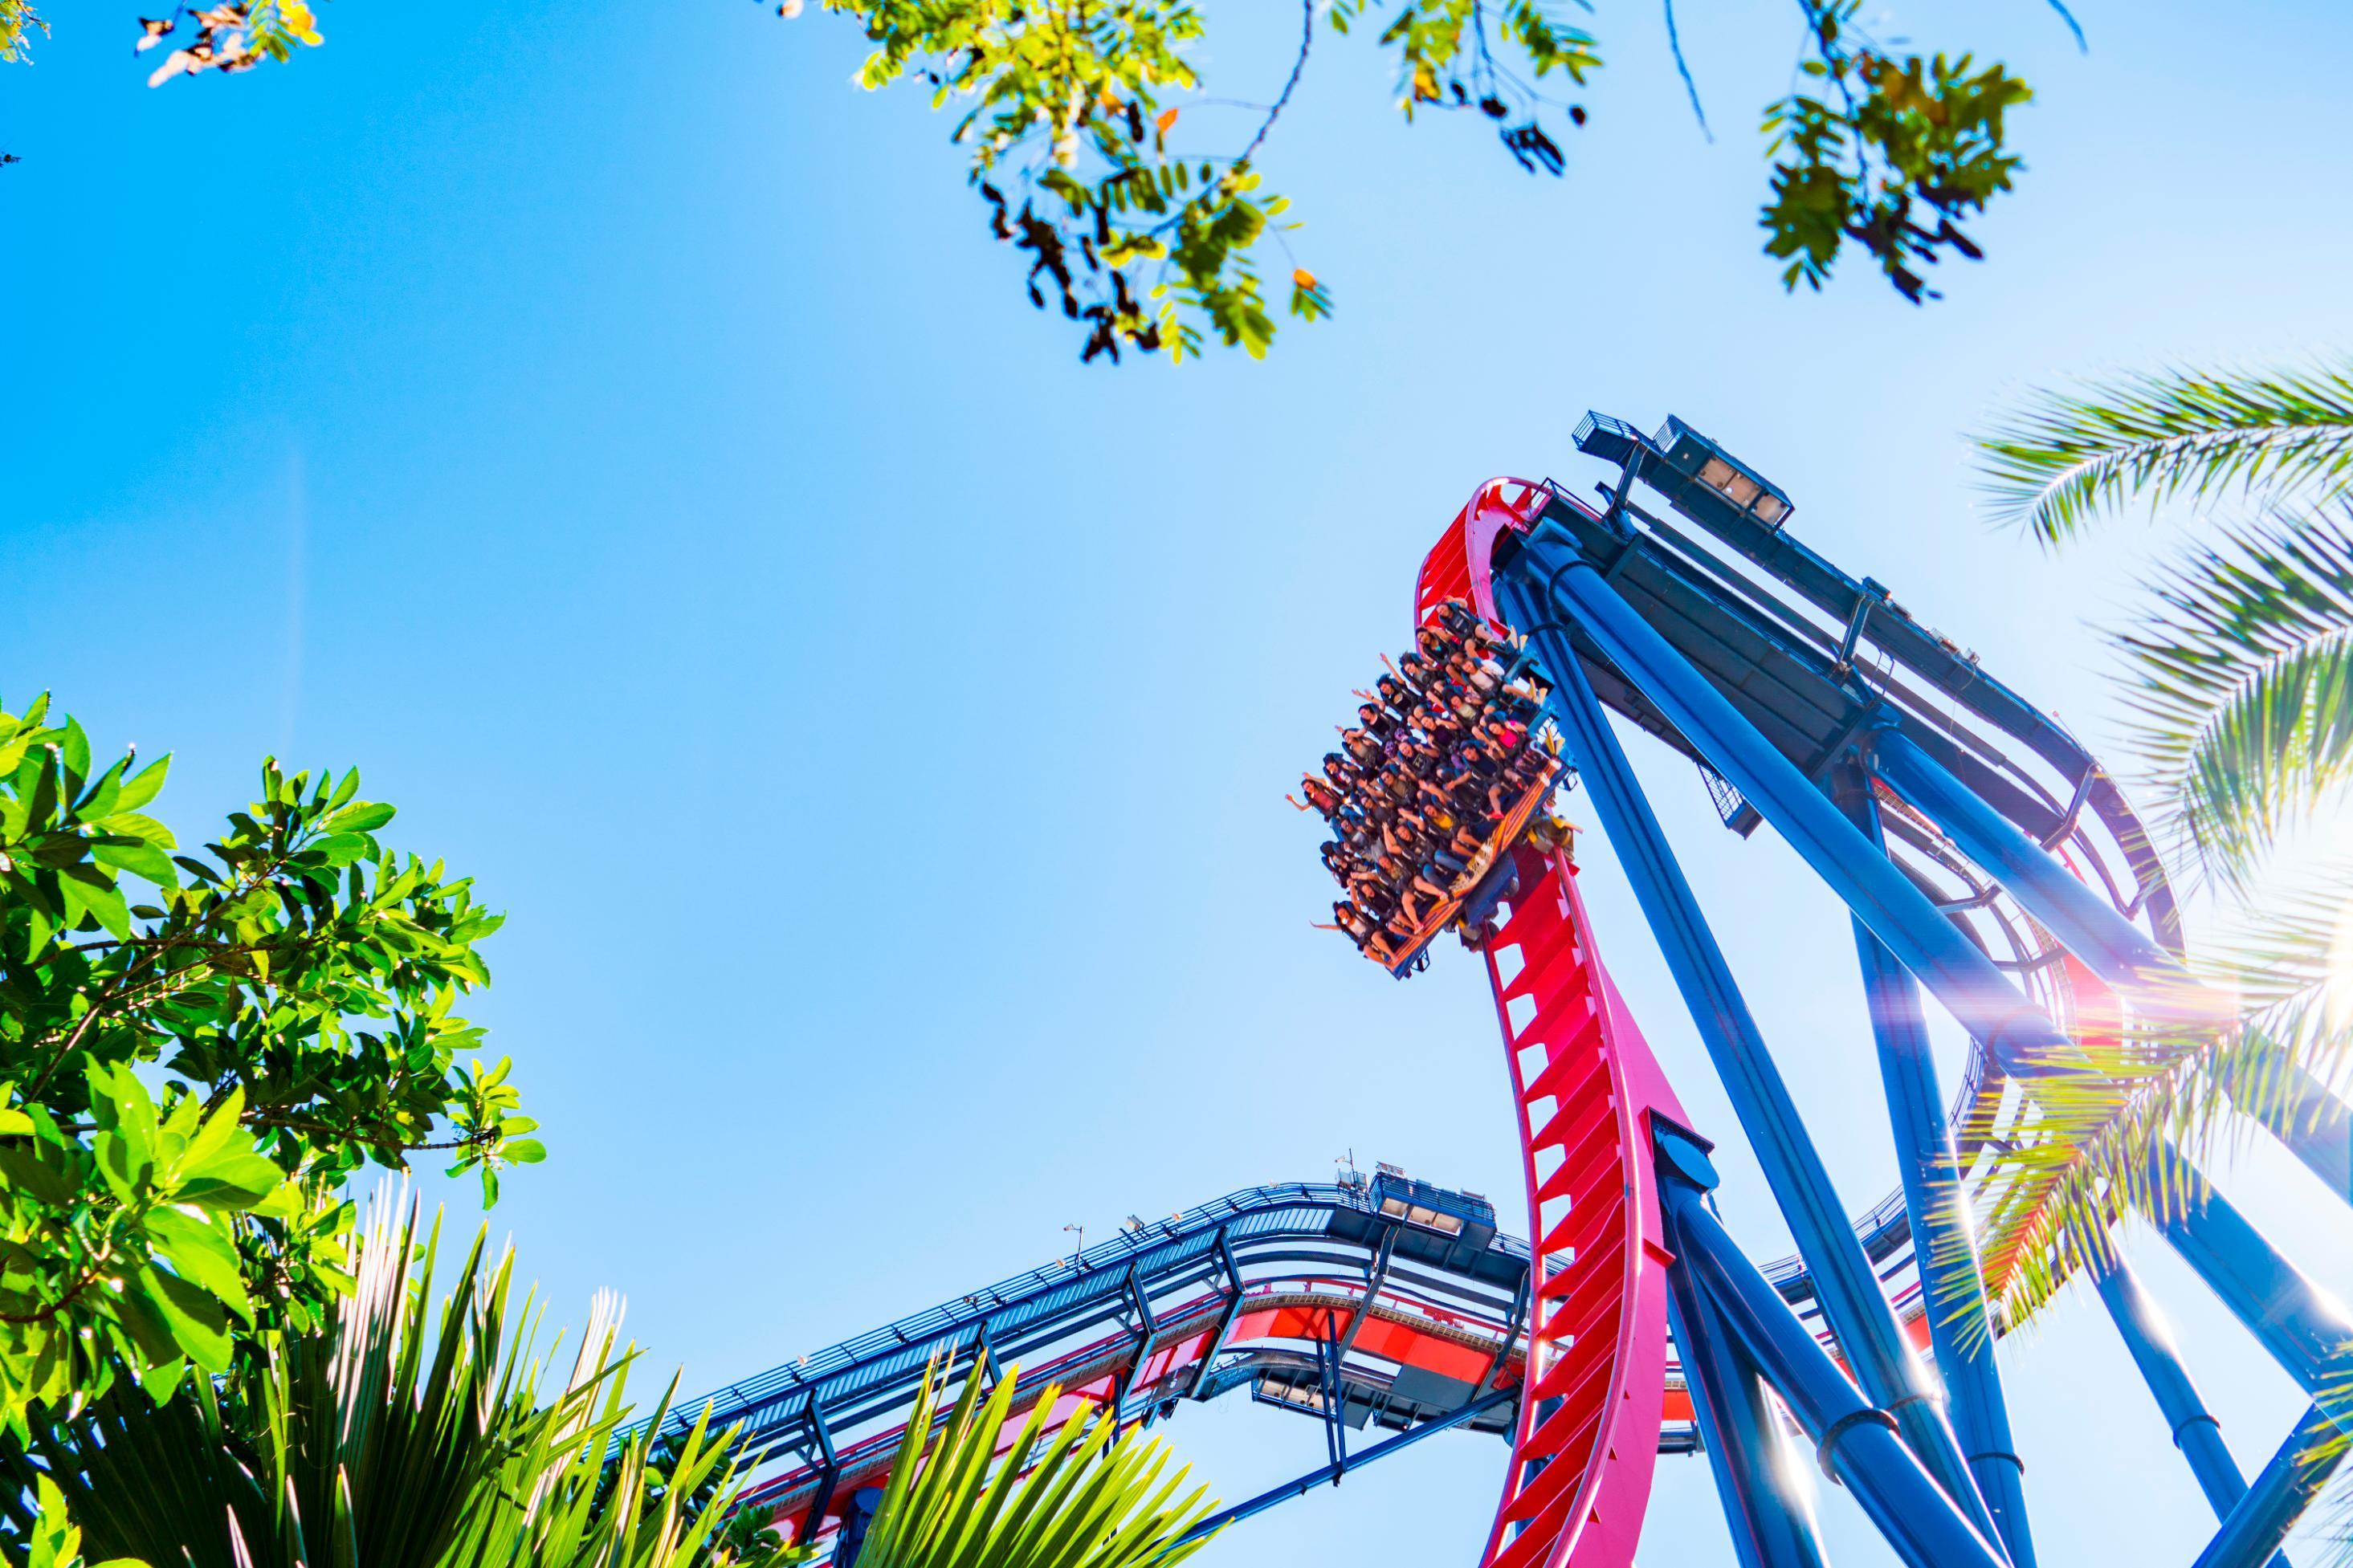 Roller coaster - Cumpara cu incredere de pe csrb.ro